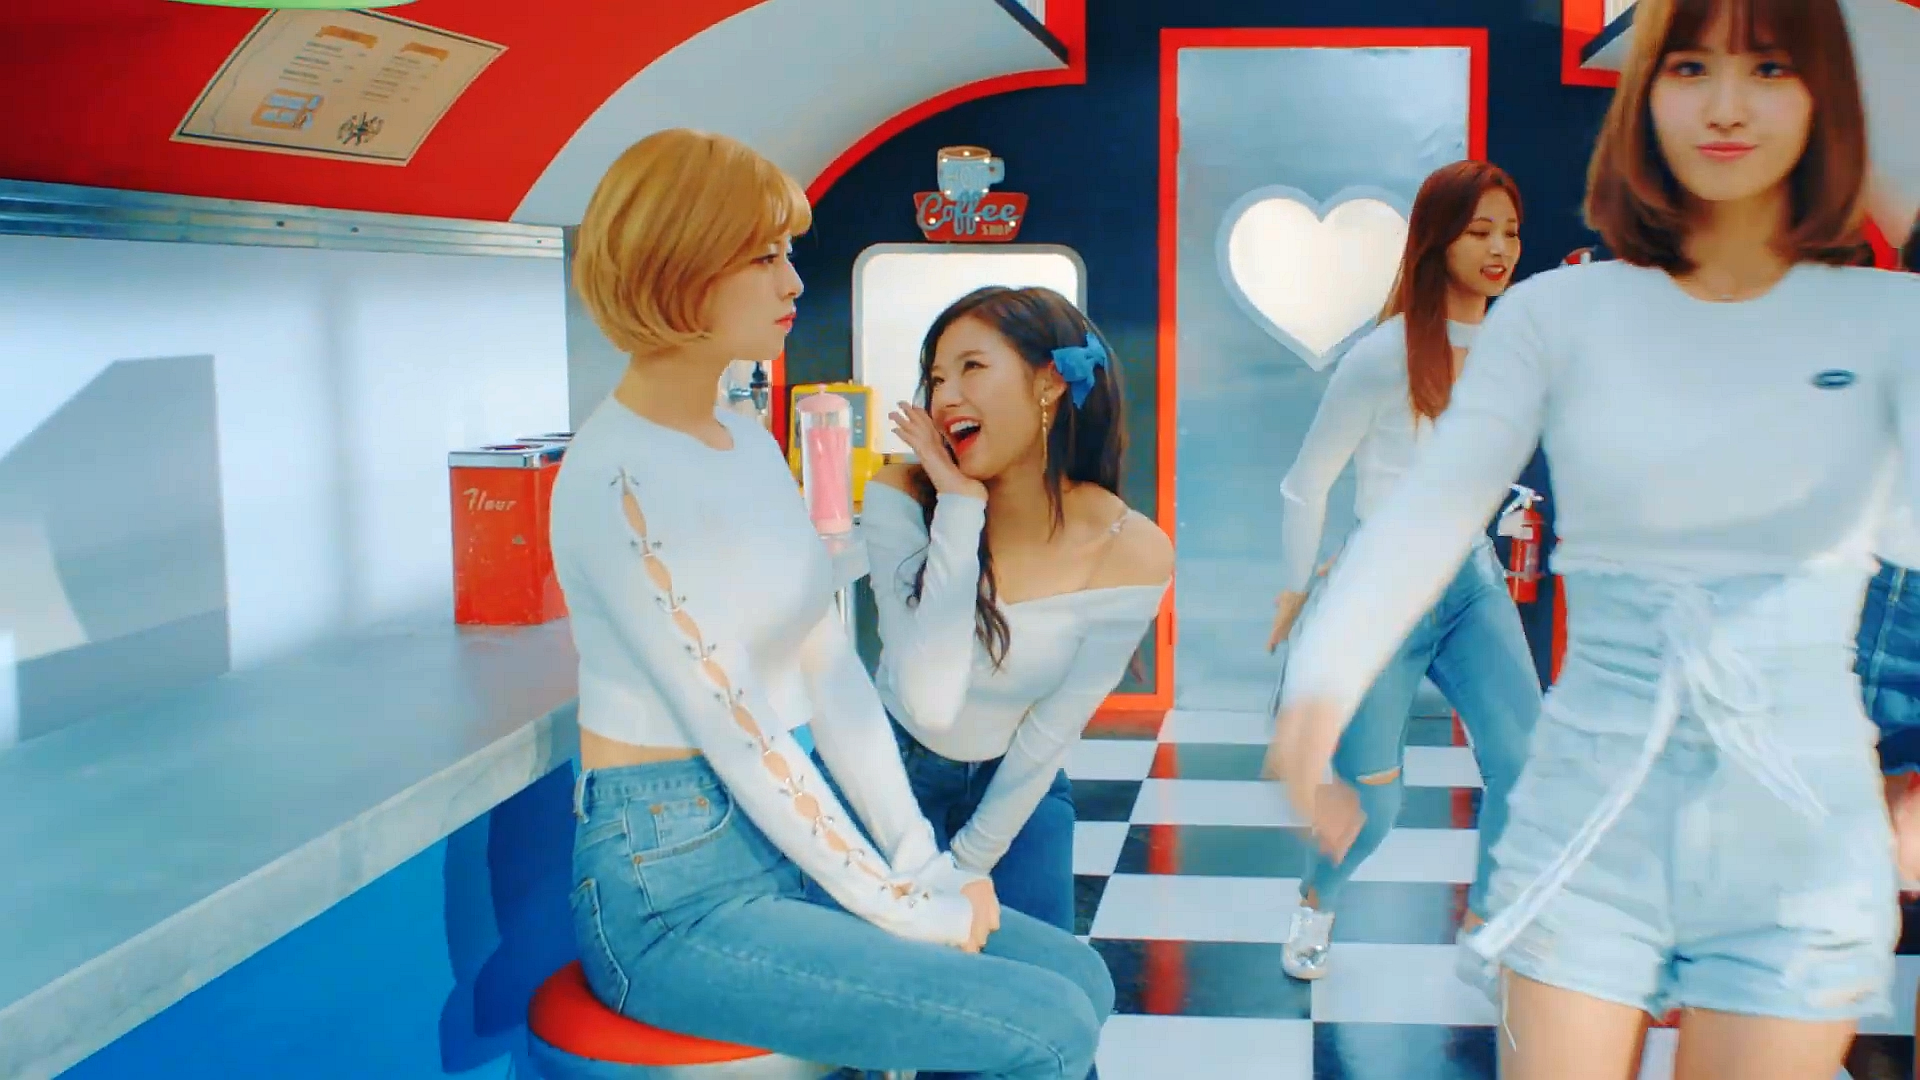 TWICE(트와이스) 'Heart Shaker' MV.mp4 (0_00_30) 001279.jpg